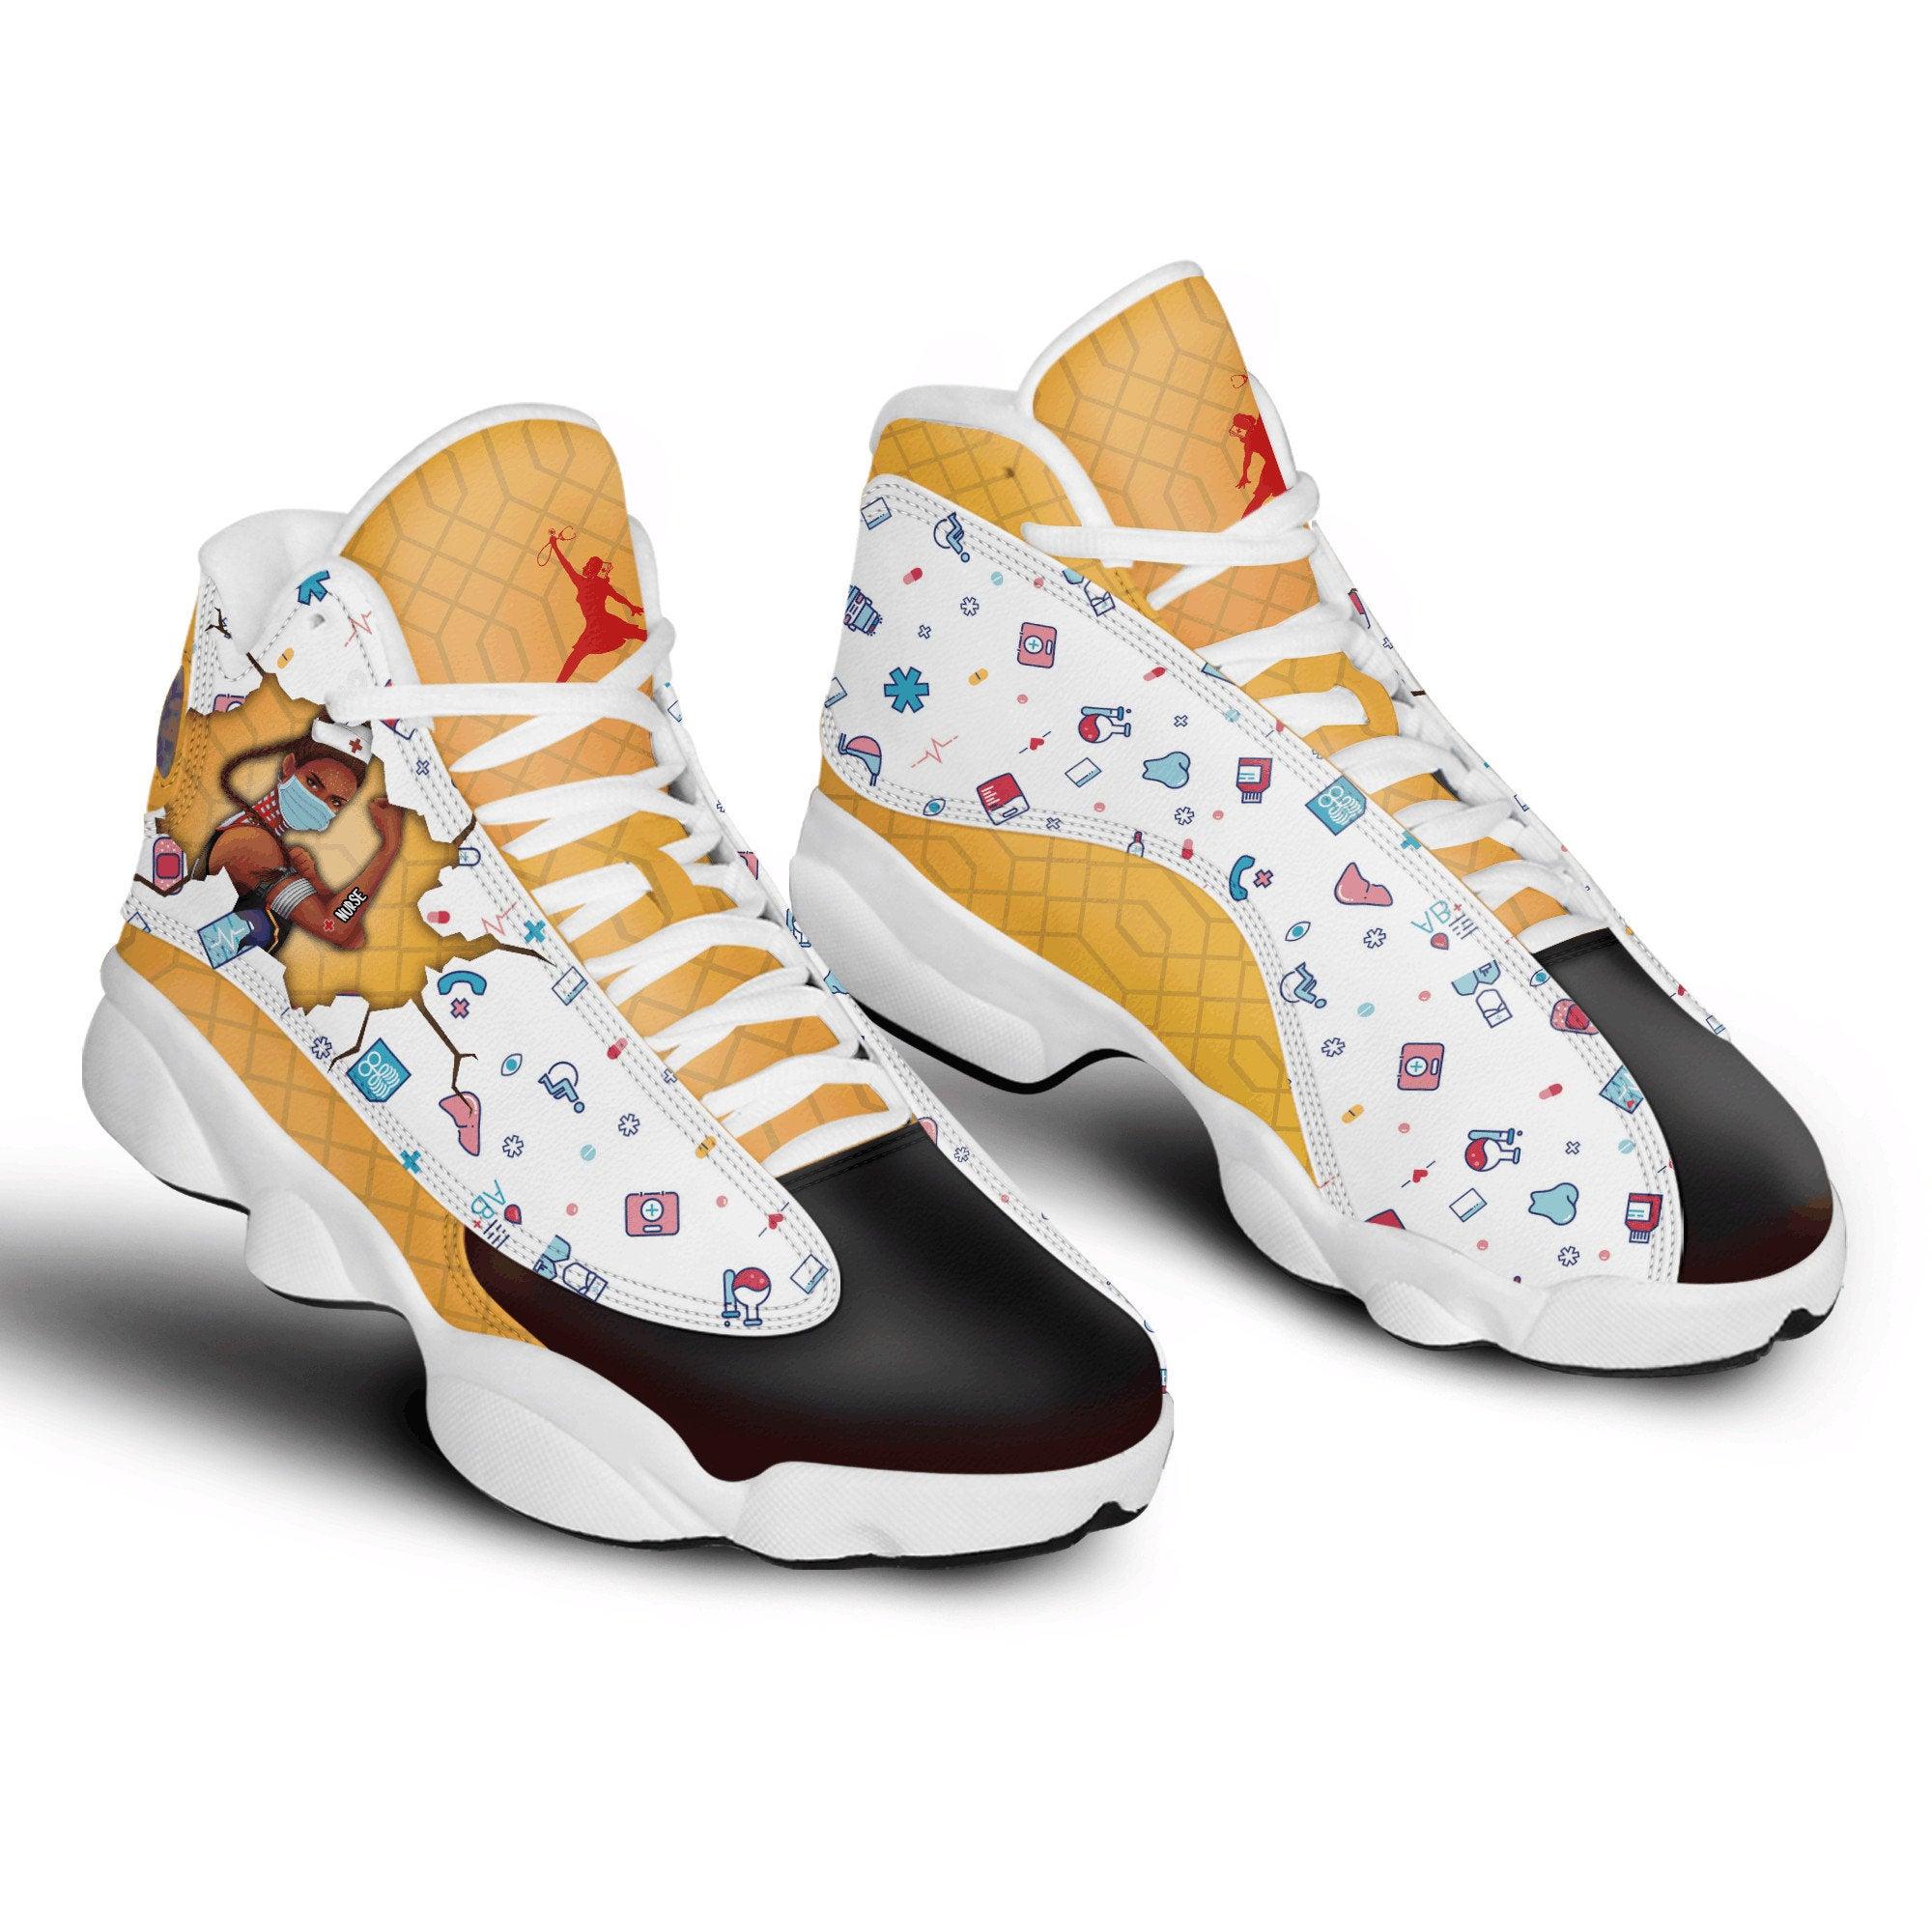 Nurse Wcdi Shuri Marvel Air Jordan Shoes